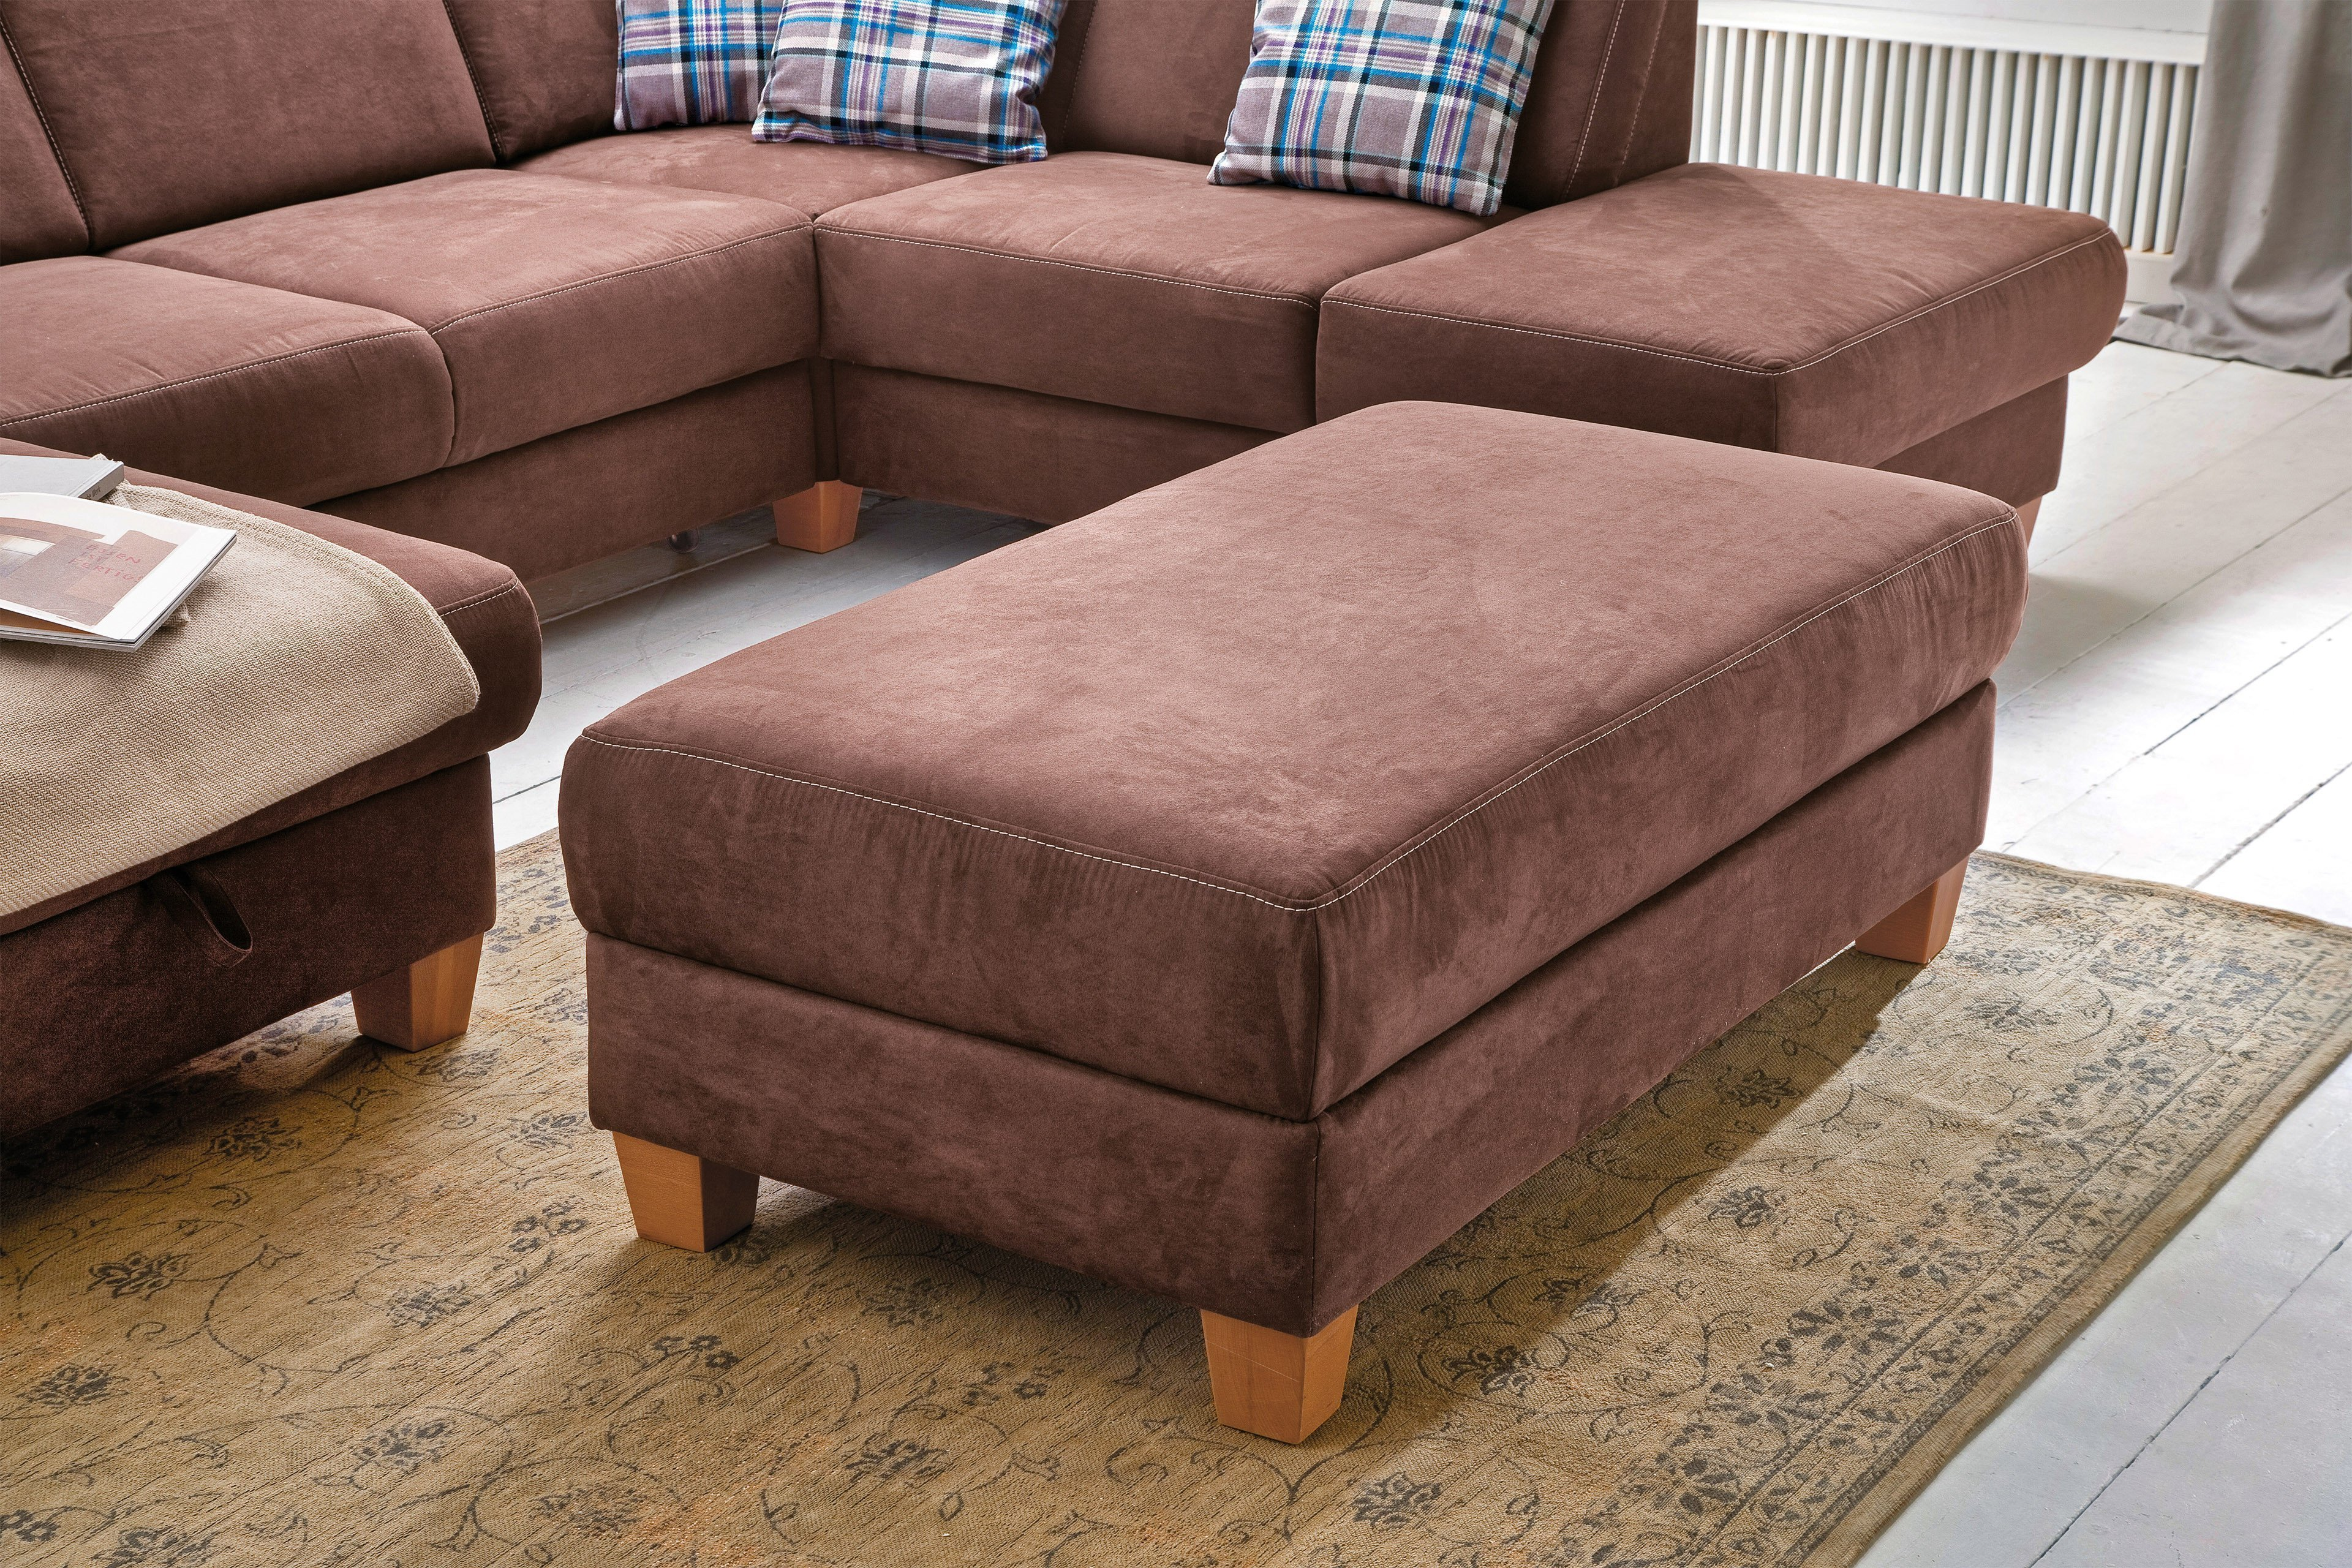 sit more madison wohnlandschaft chocco m bel letz ihr online shop. Black Bedroom Furniture Sets. Home Design Ideas